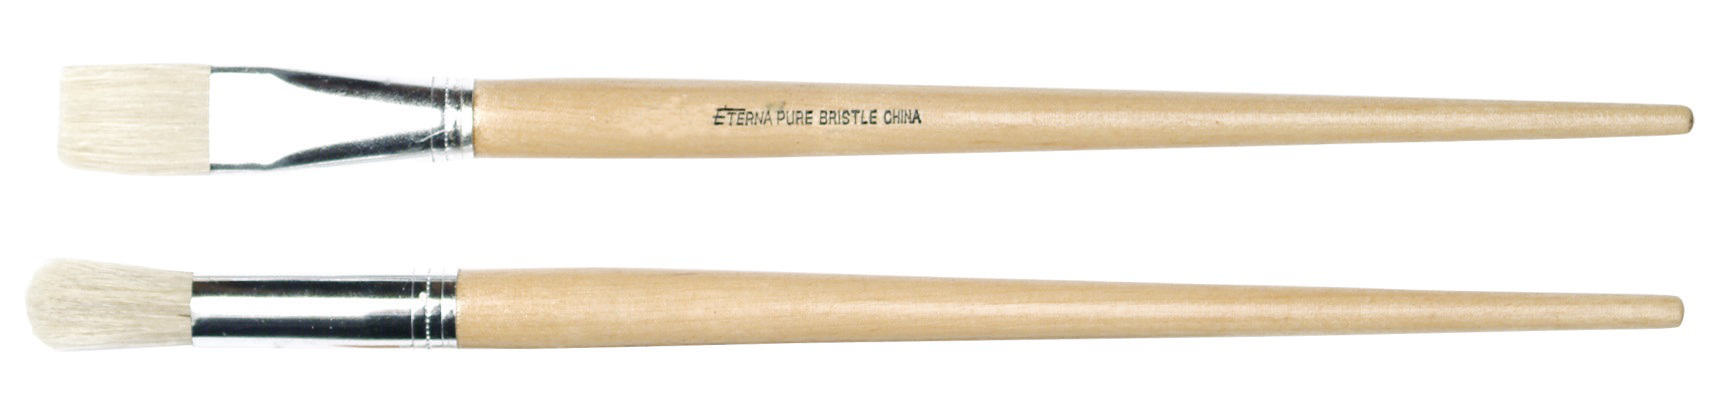 No.4 Flat Hog Brush